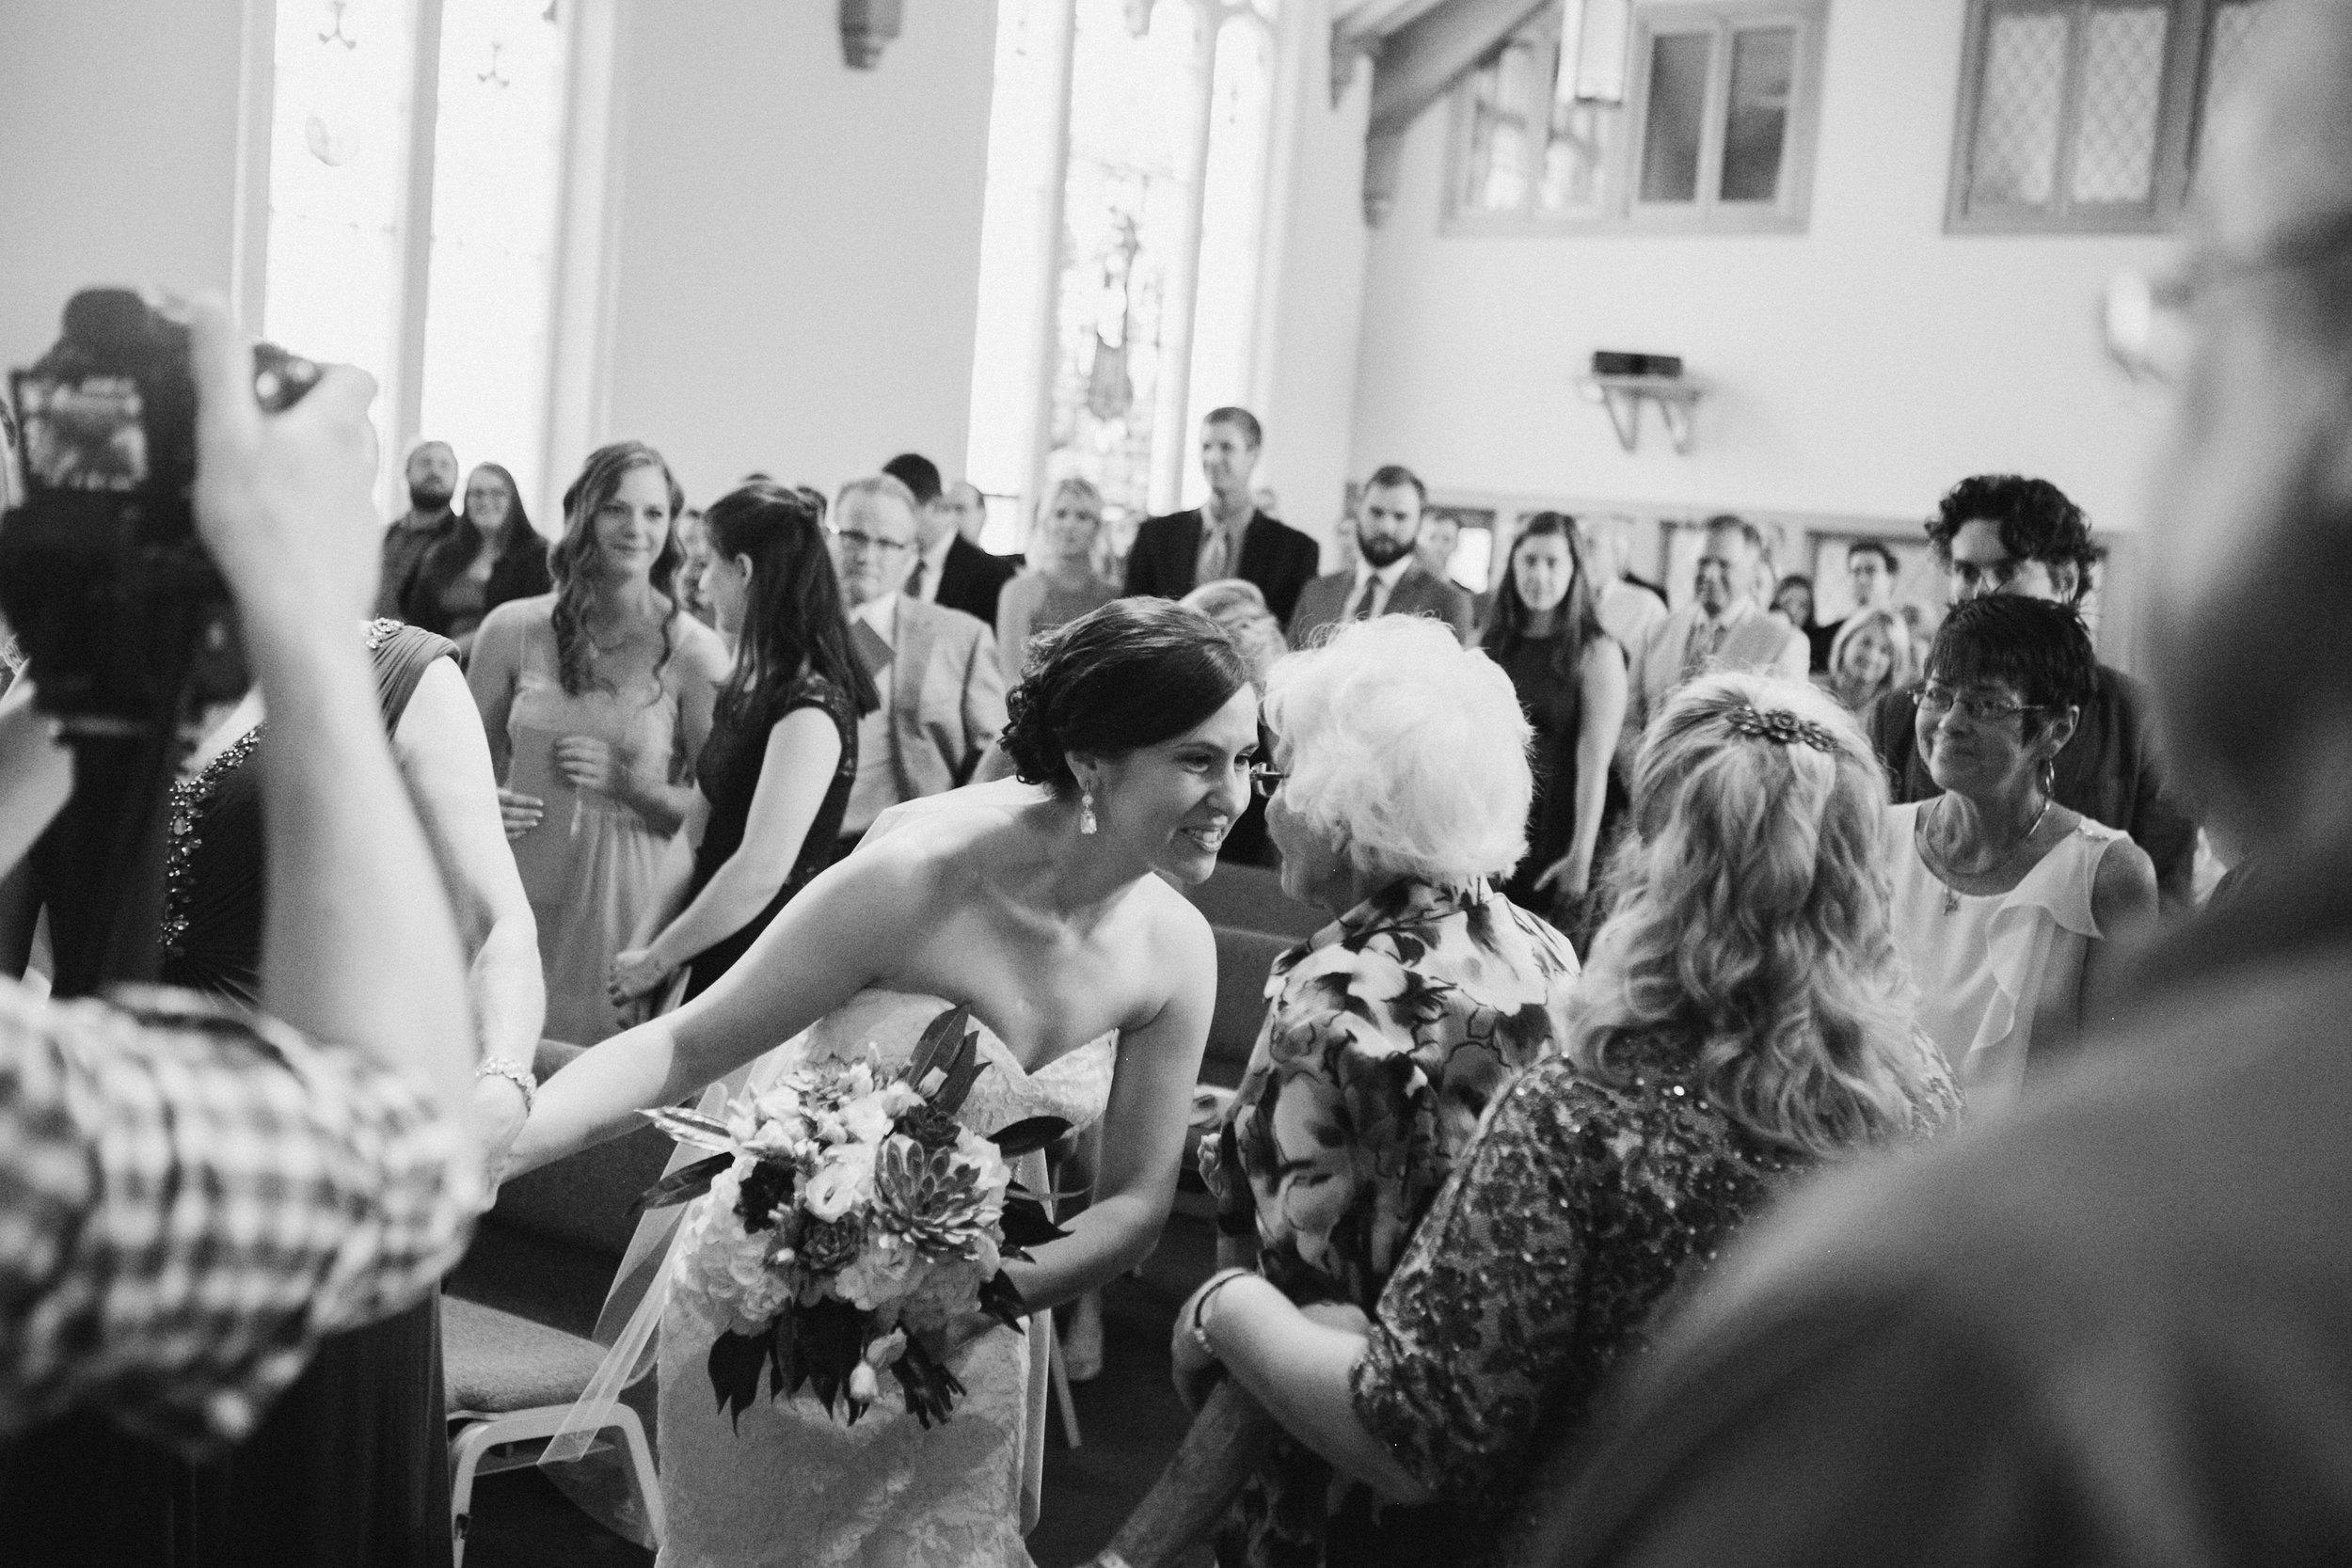 wisconsin-wedding-acowsay-uttke-photography-30.jpg